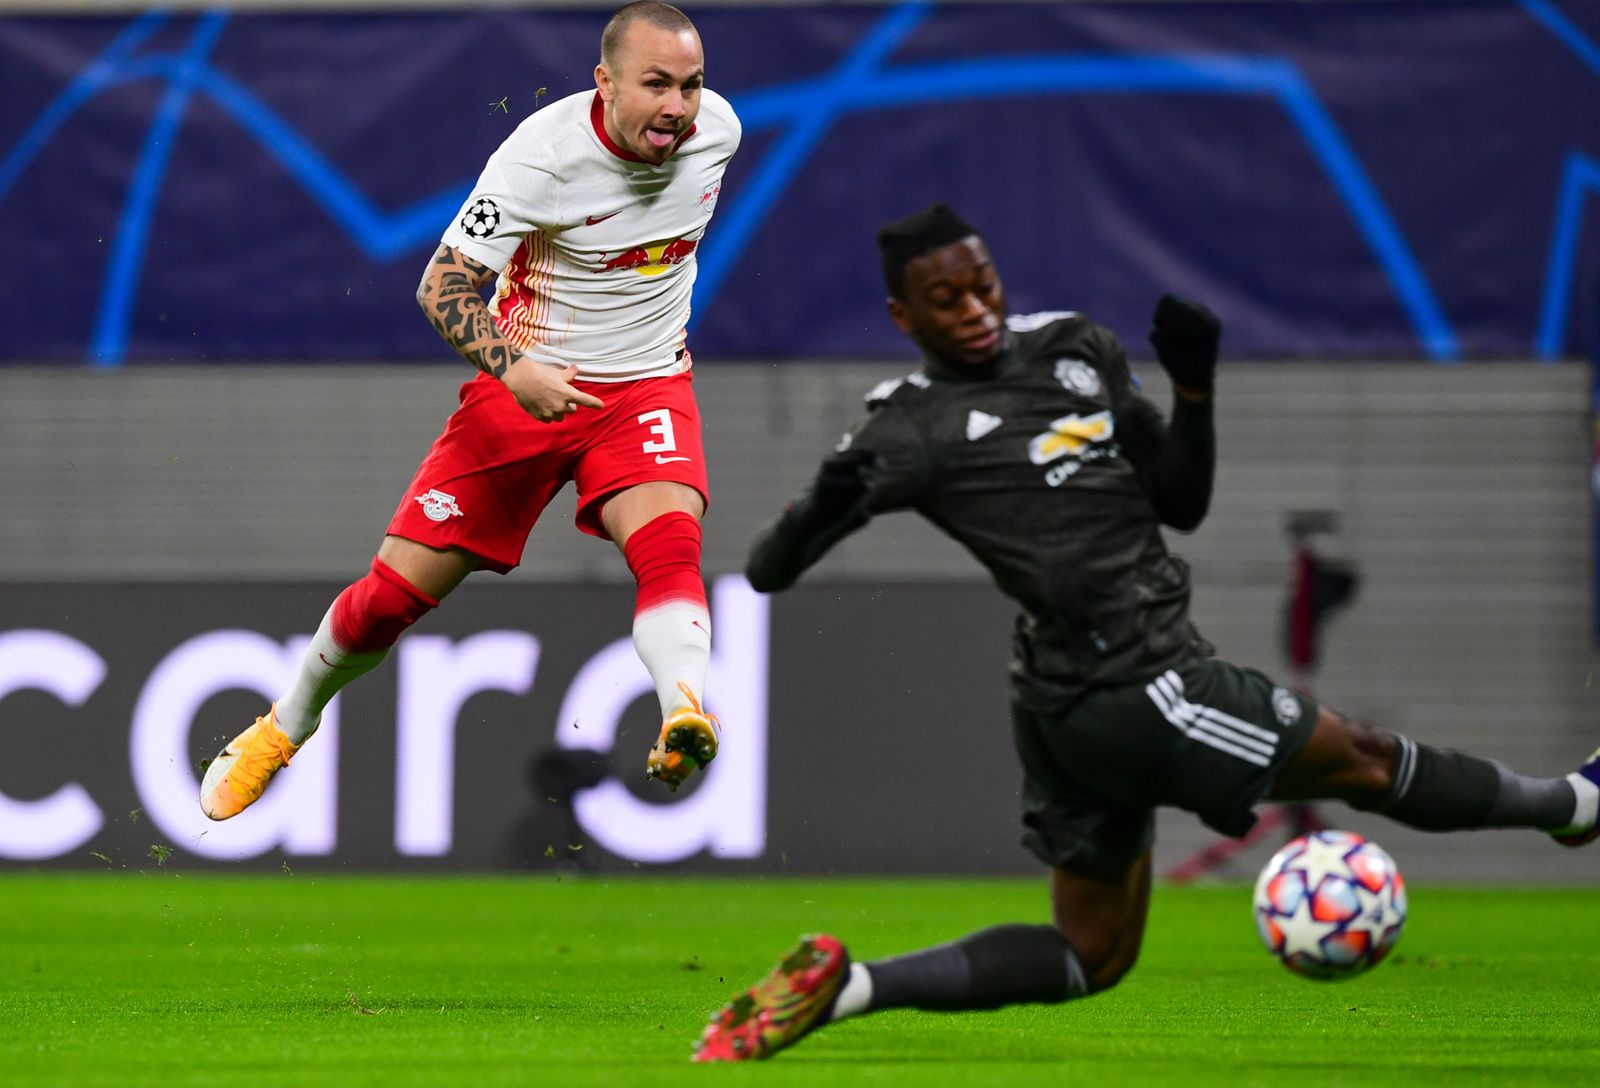 RB Leipzig vs Manchester United, Germany - 08 Dec 2020